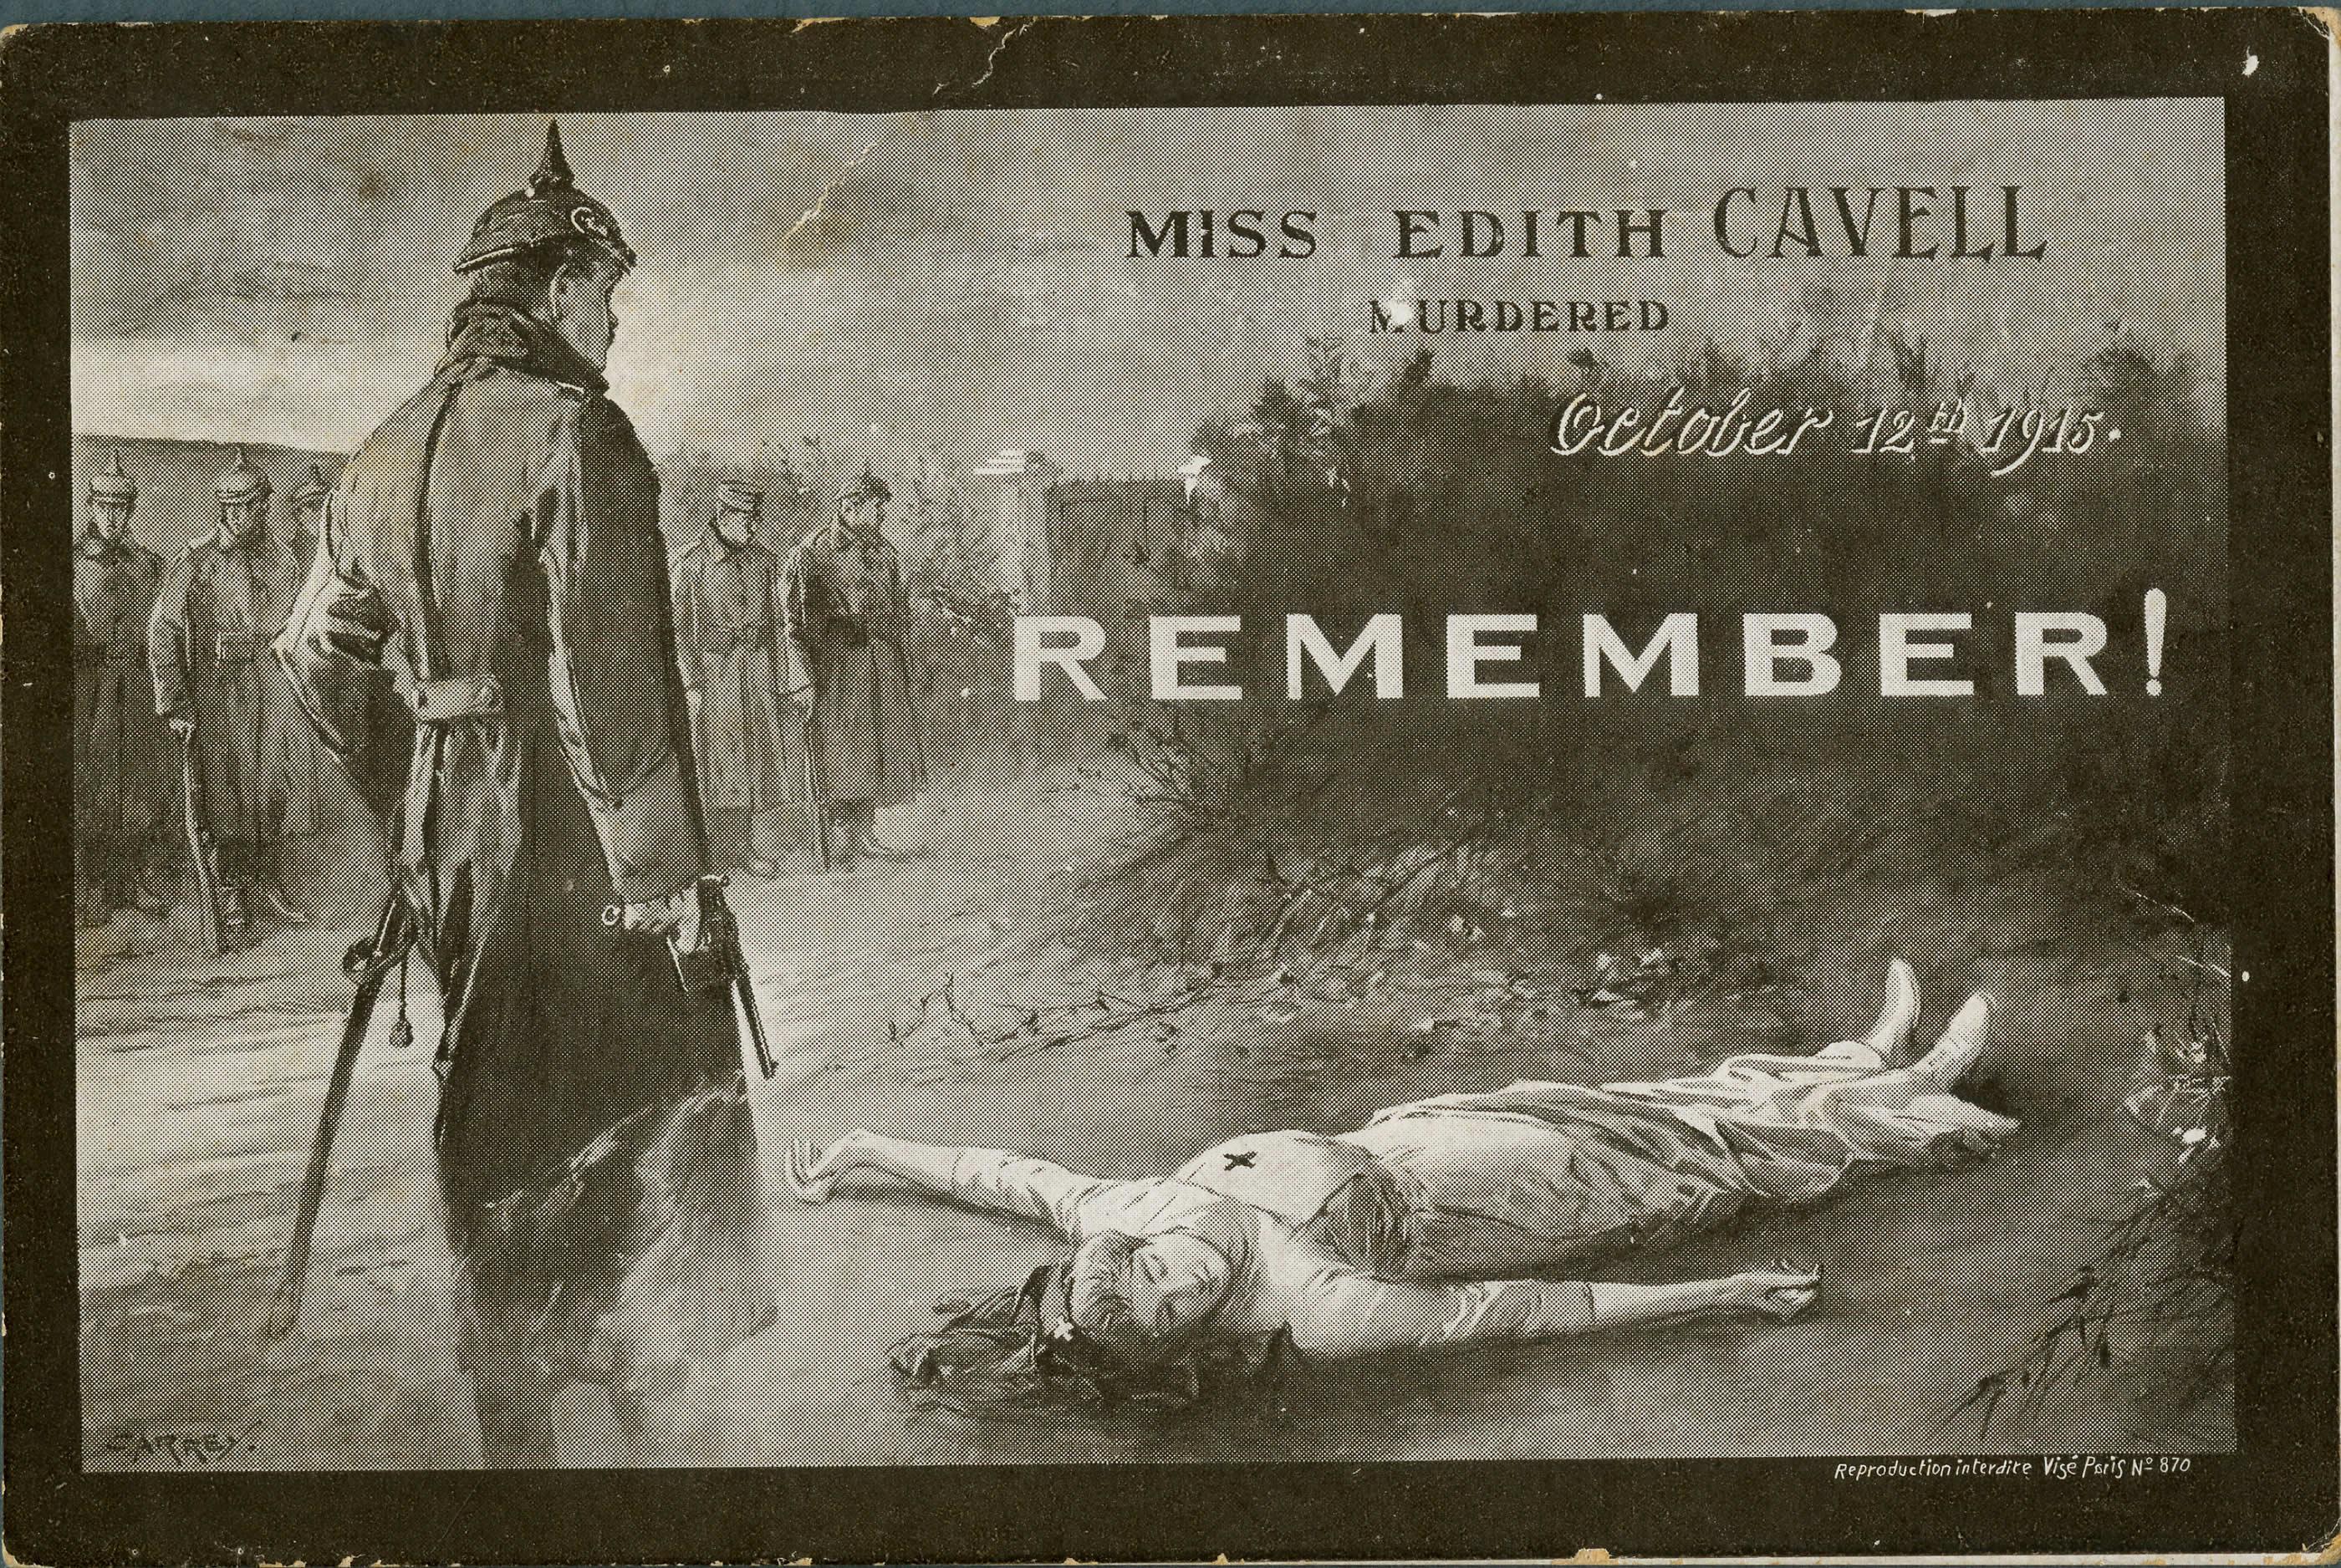 Edith Cavell Biography